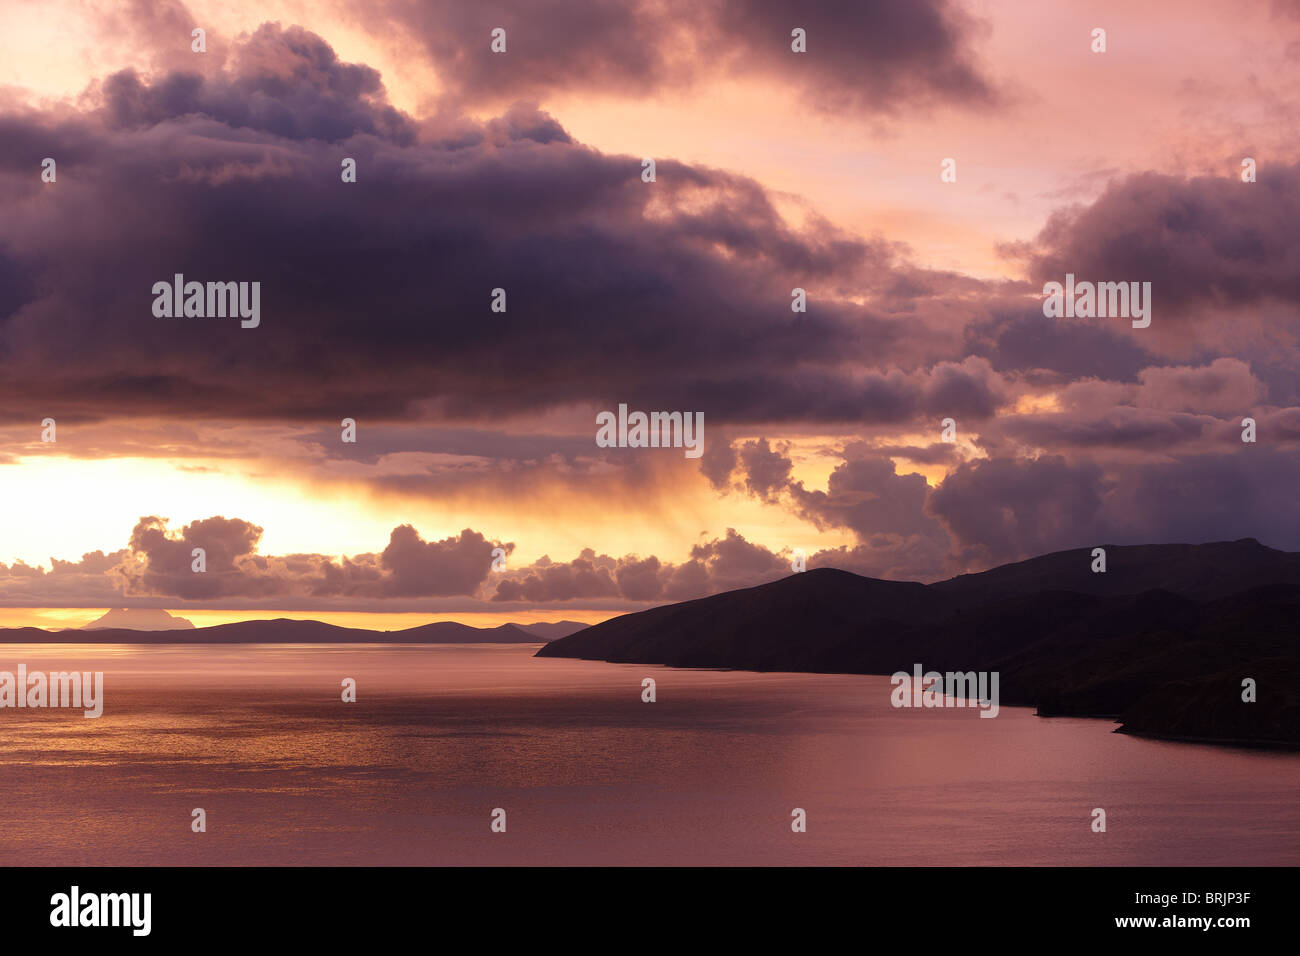 Al amanecer del lago Titicaca, Bolivia Imagen De Stock